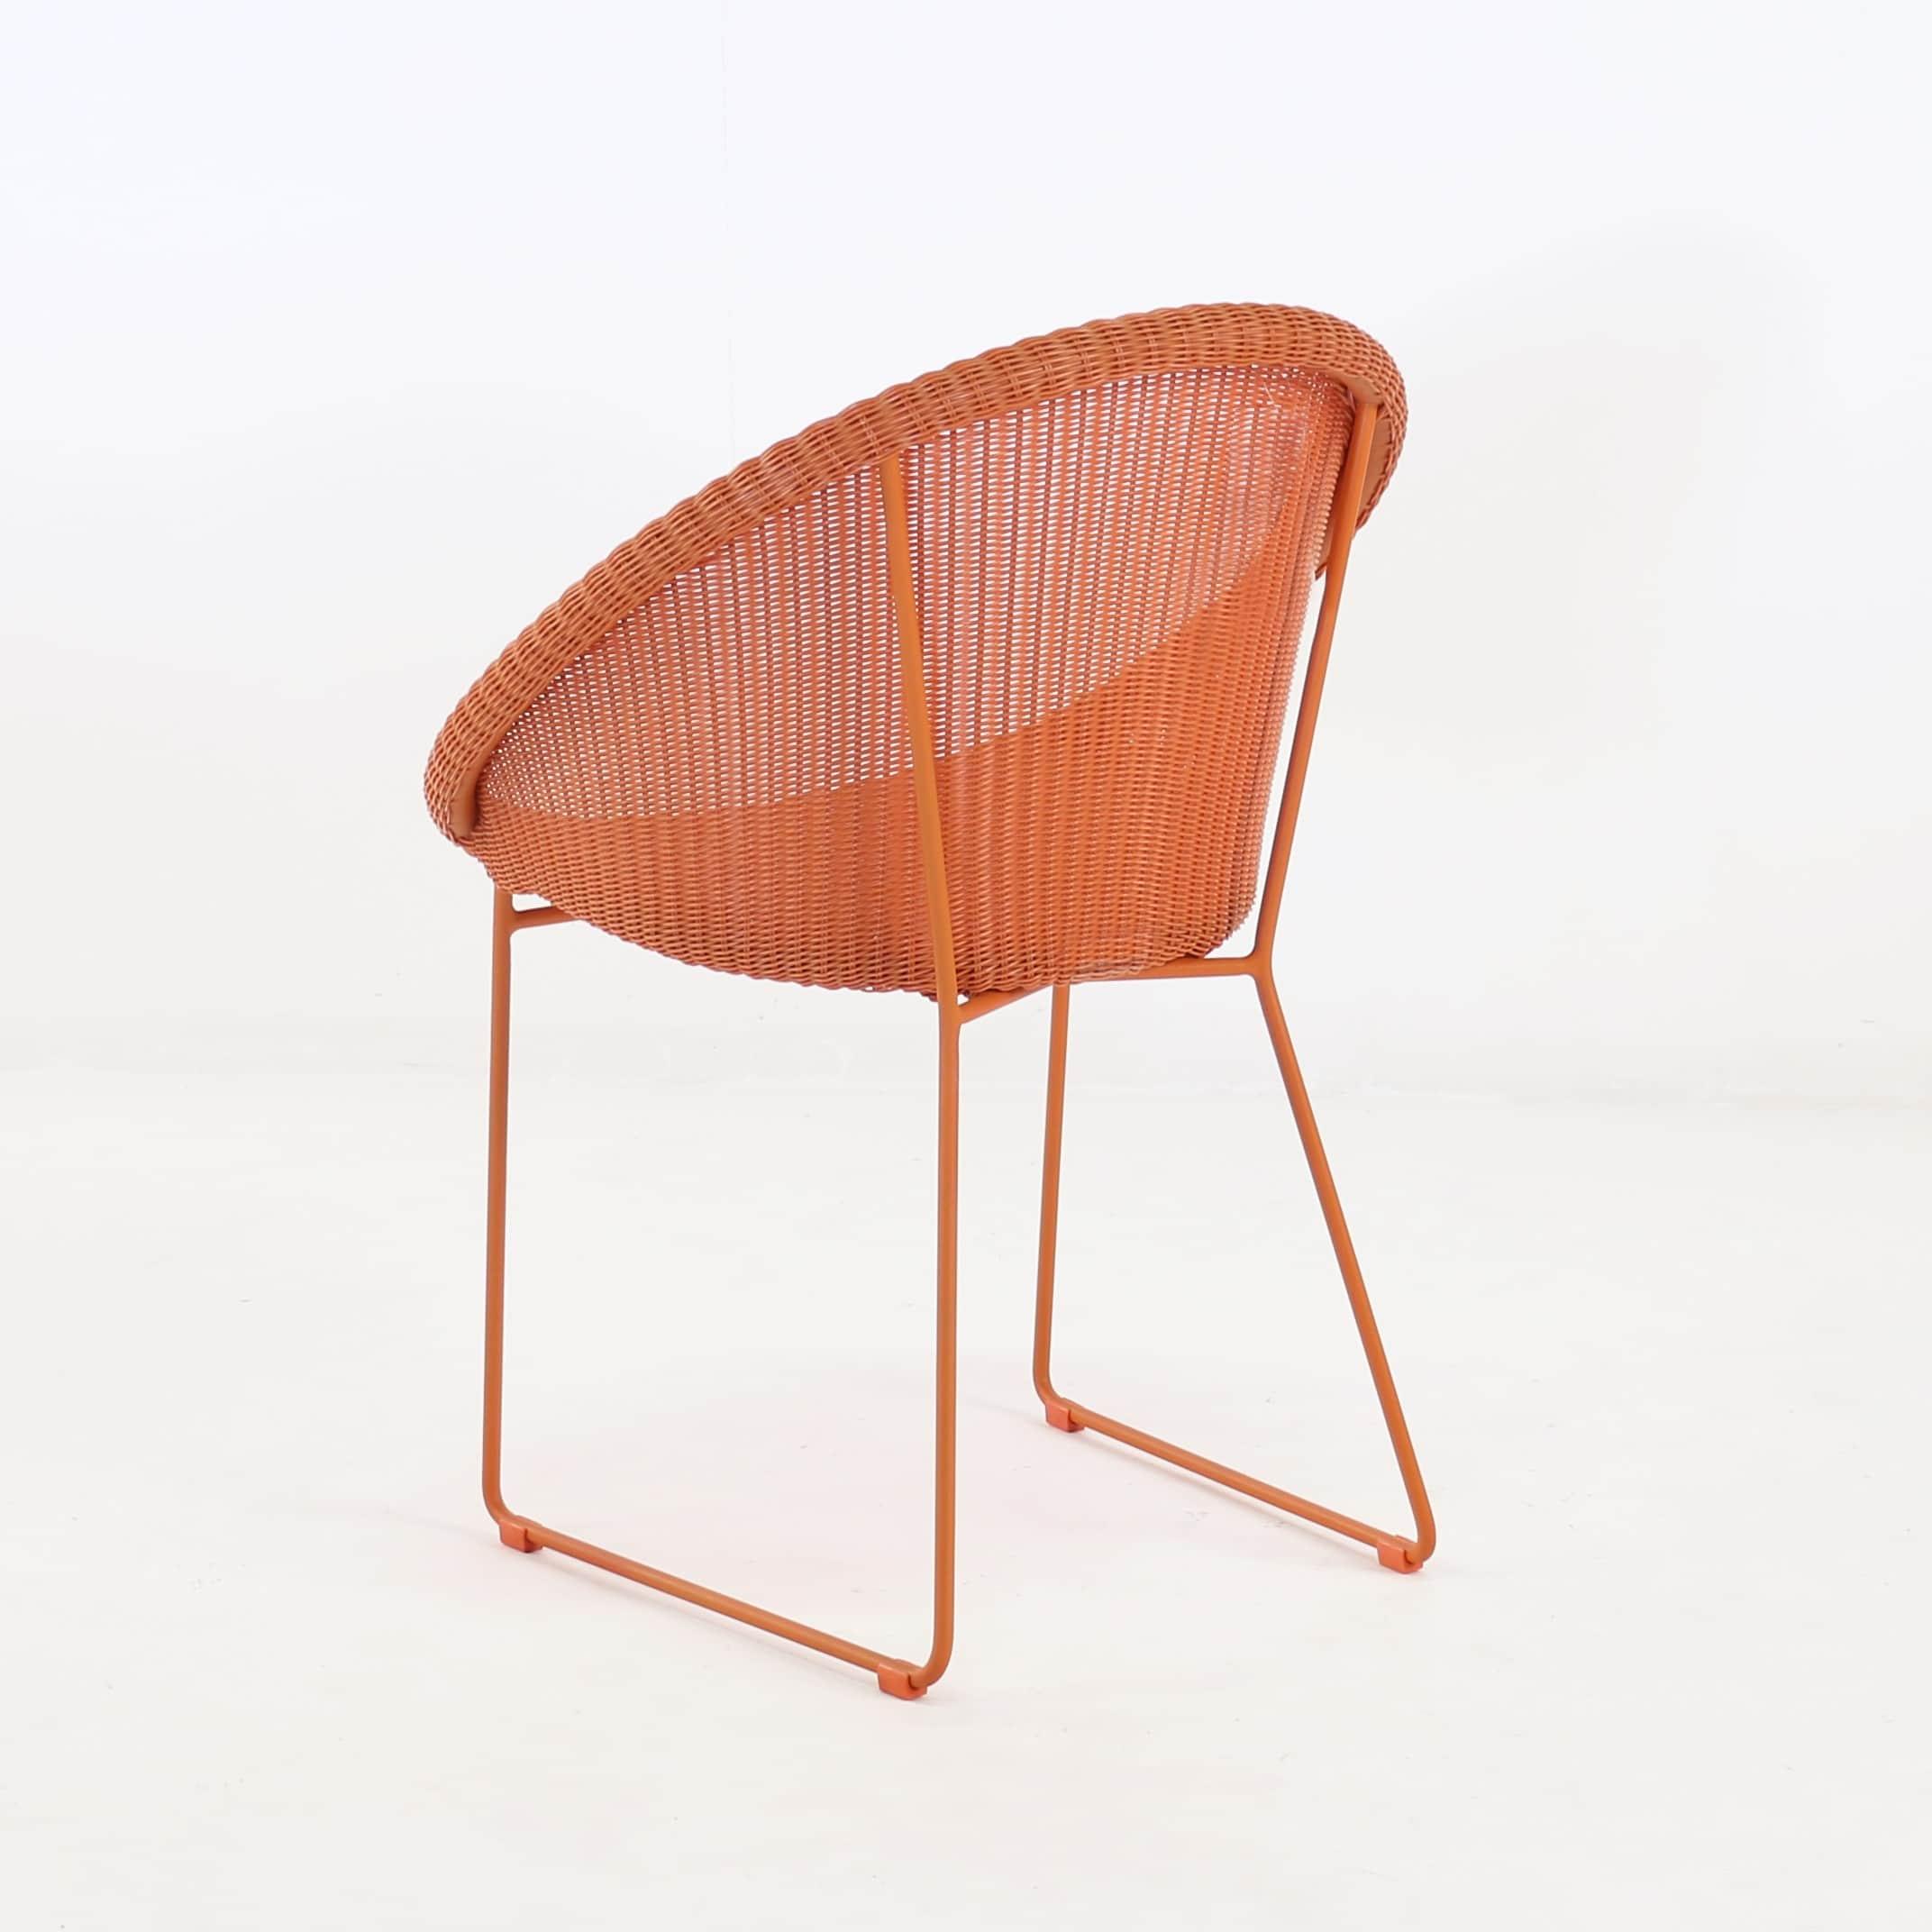 orange wicker chair cushions cheap outdoor lounge chairs metro dining teak warehouse